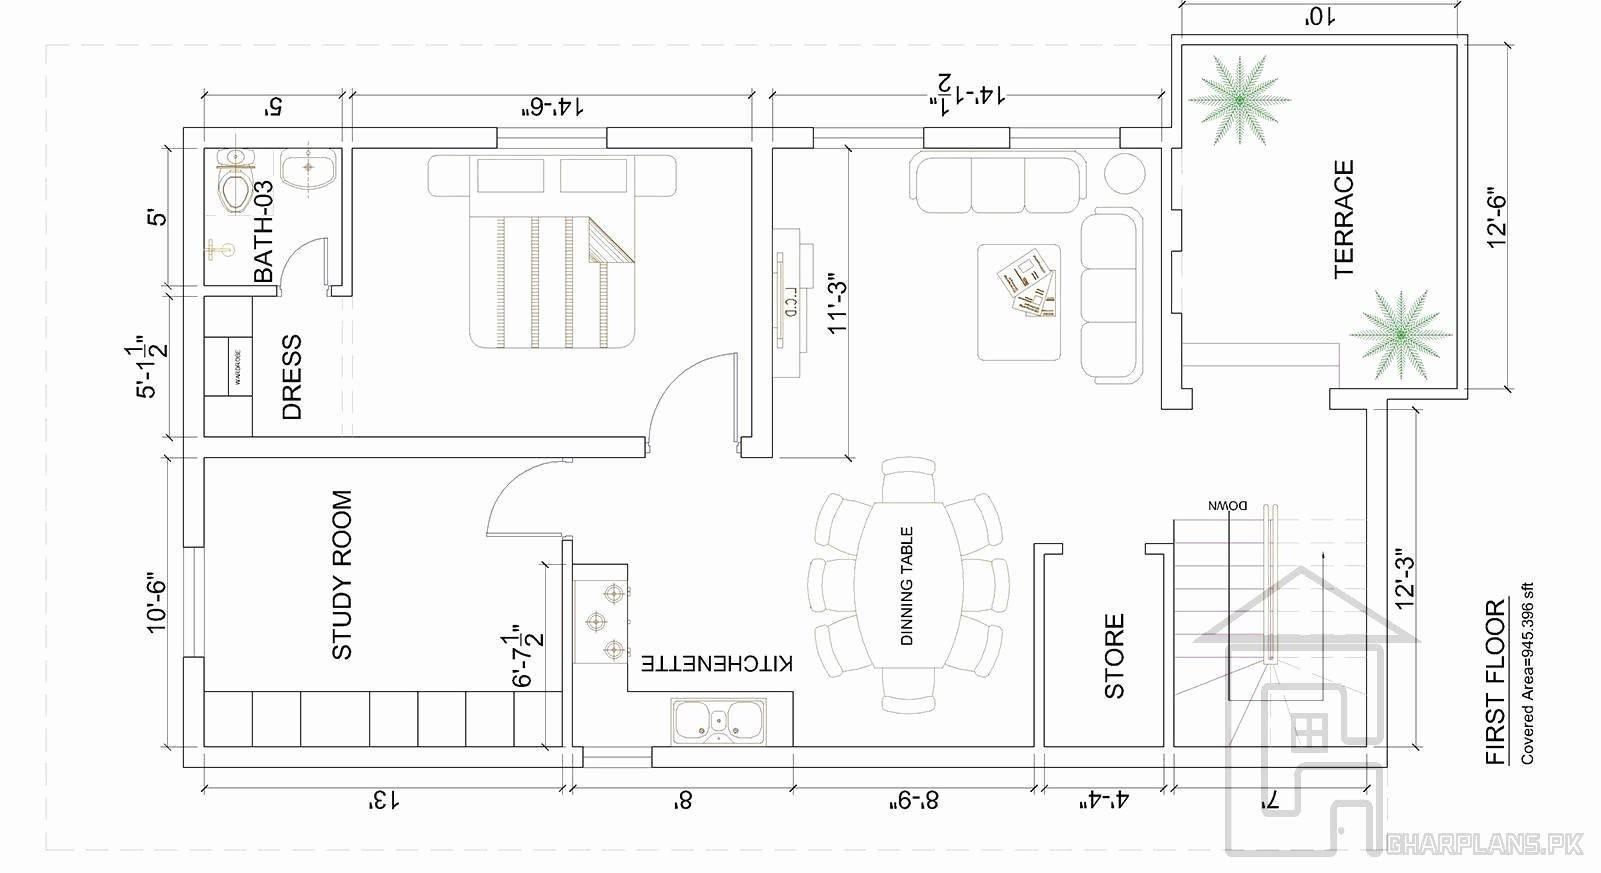 Ipad Mini 3 Circuit Diagram Schematic Wire Wiring Image 4 Parts Information Luxury Level